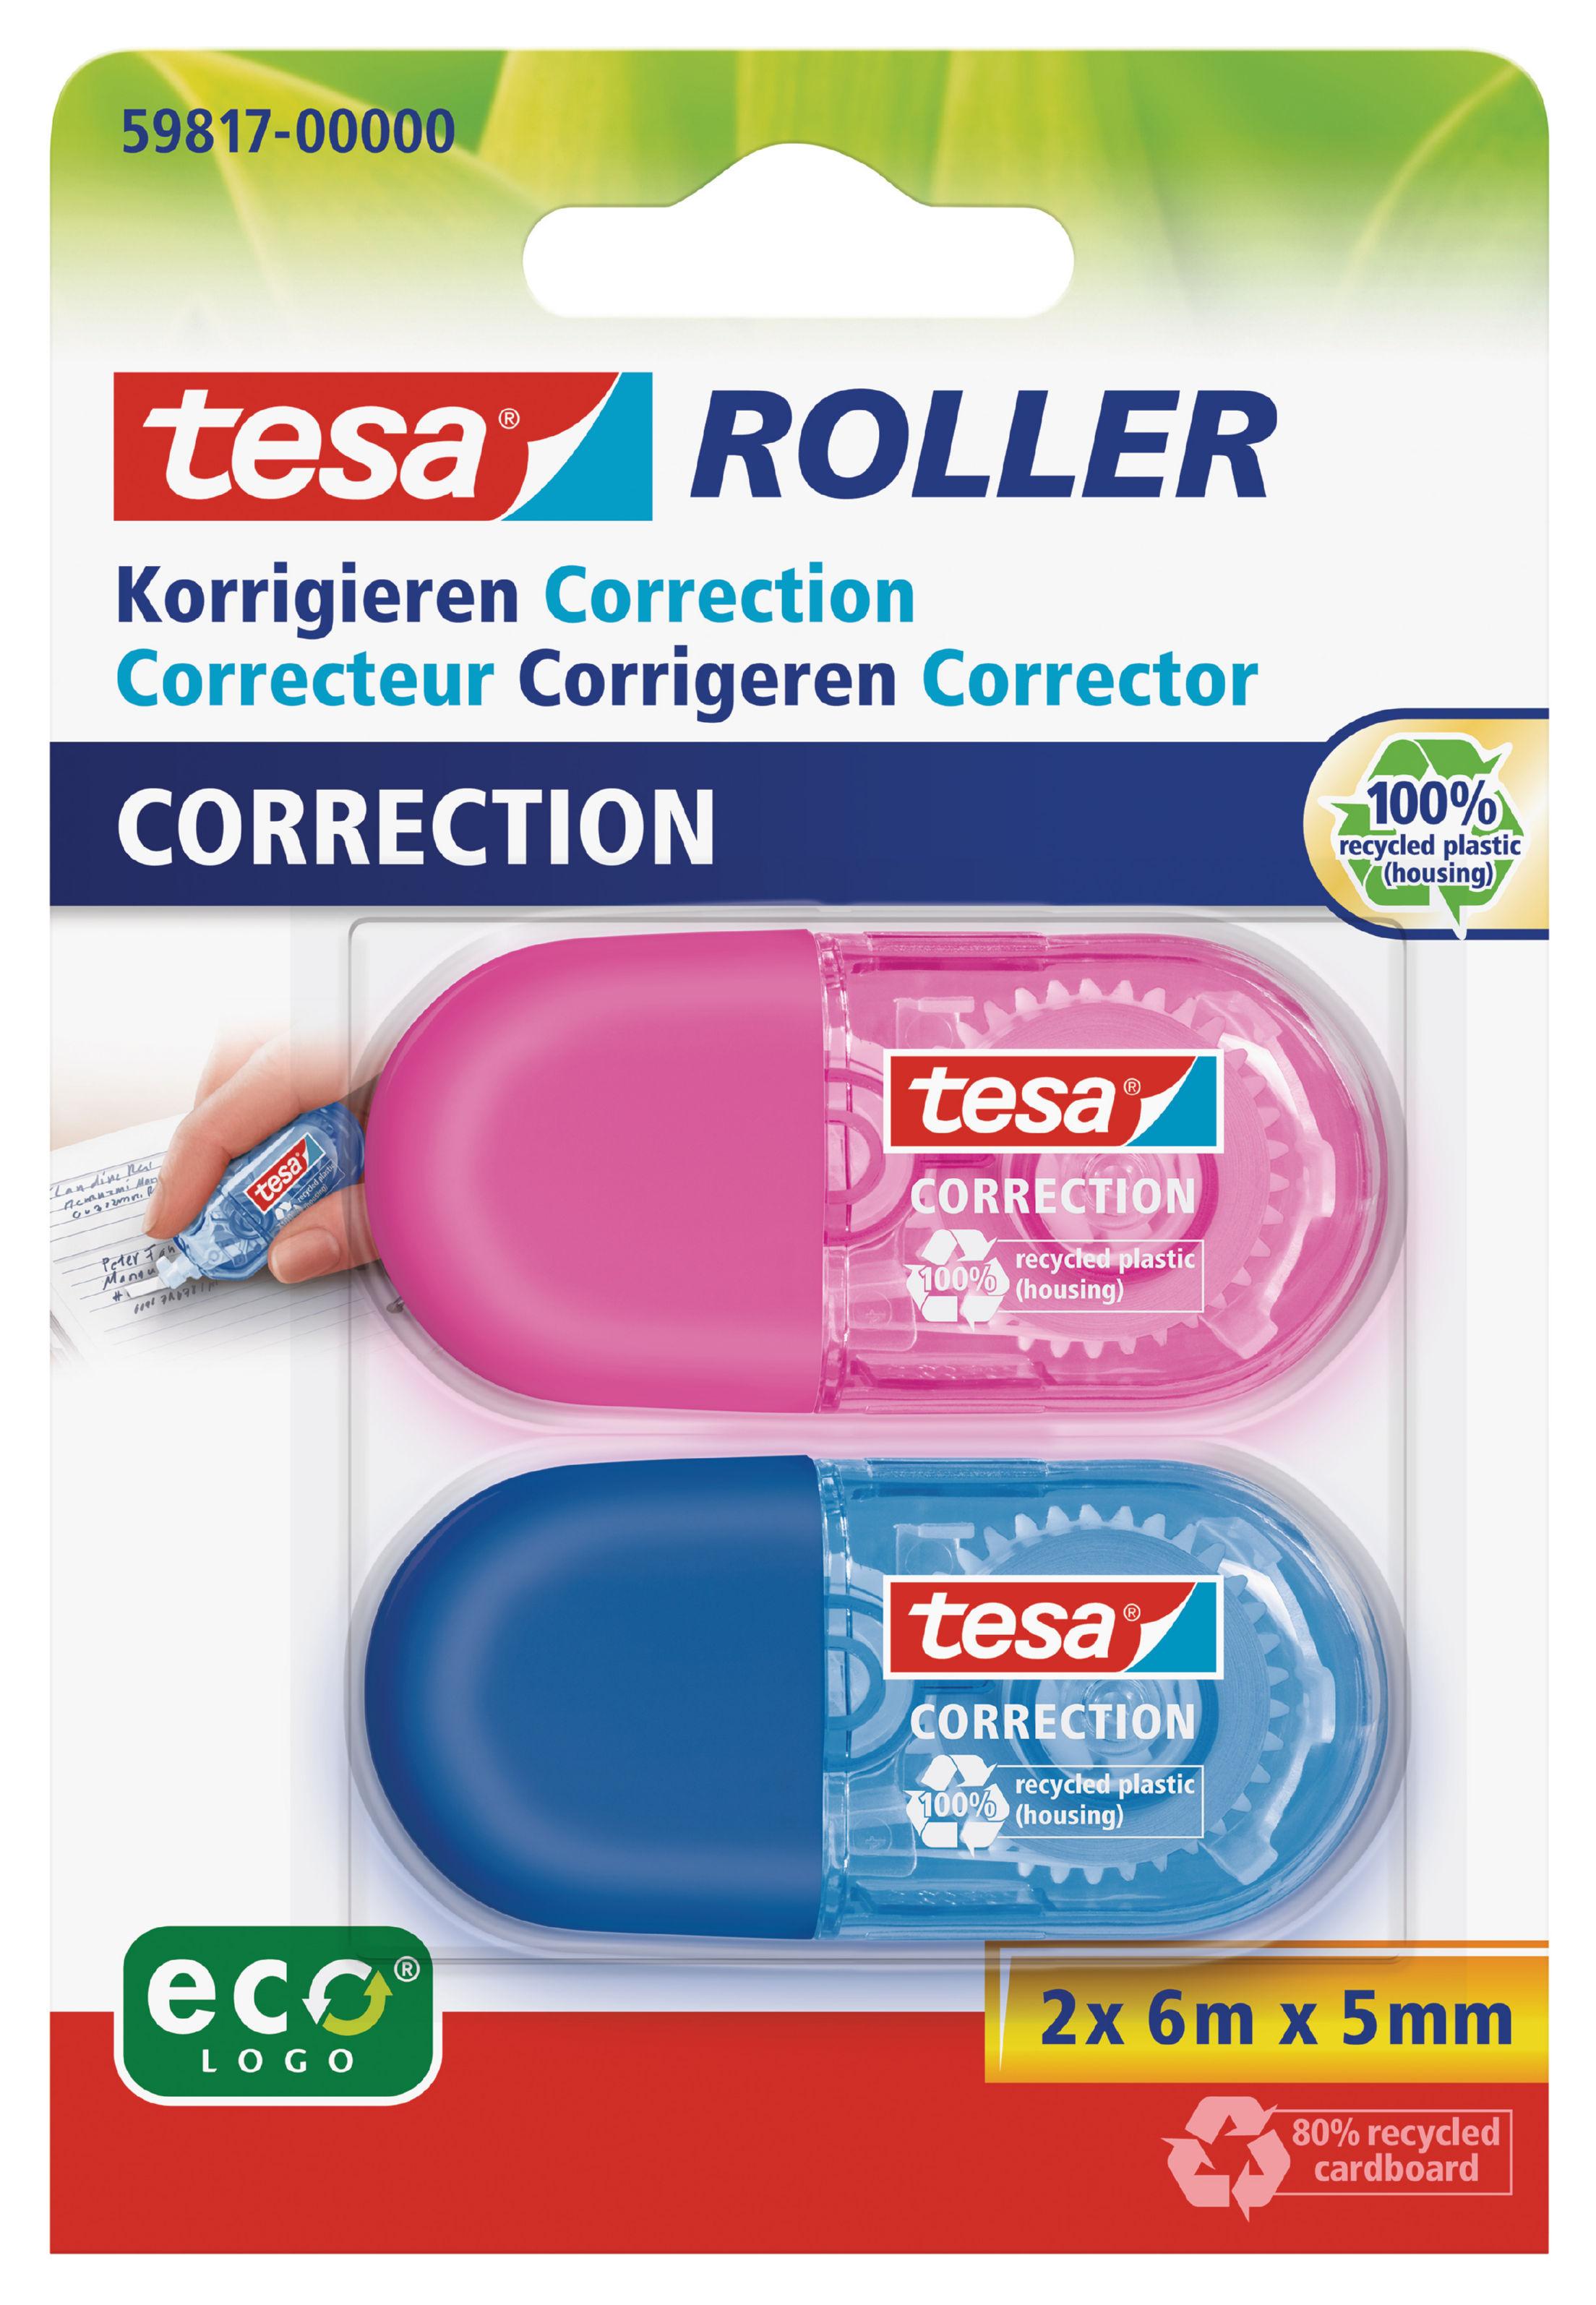 Correction Tape tesa Mini Correction Tape Roller 5mmx6m White (Pack 2) 59817